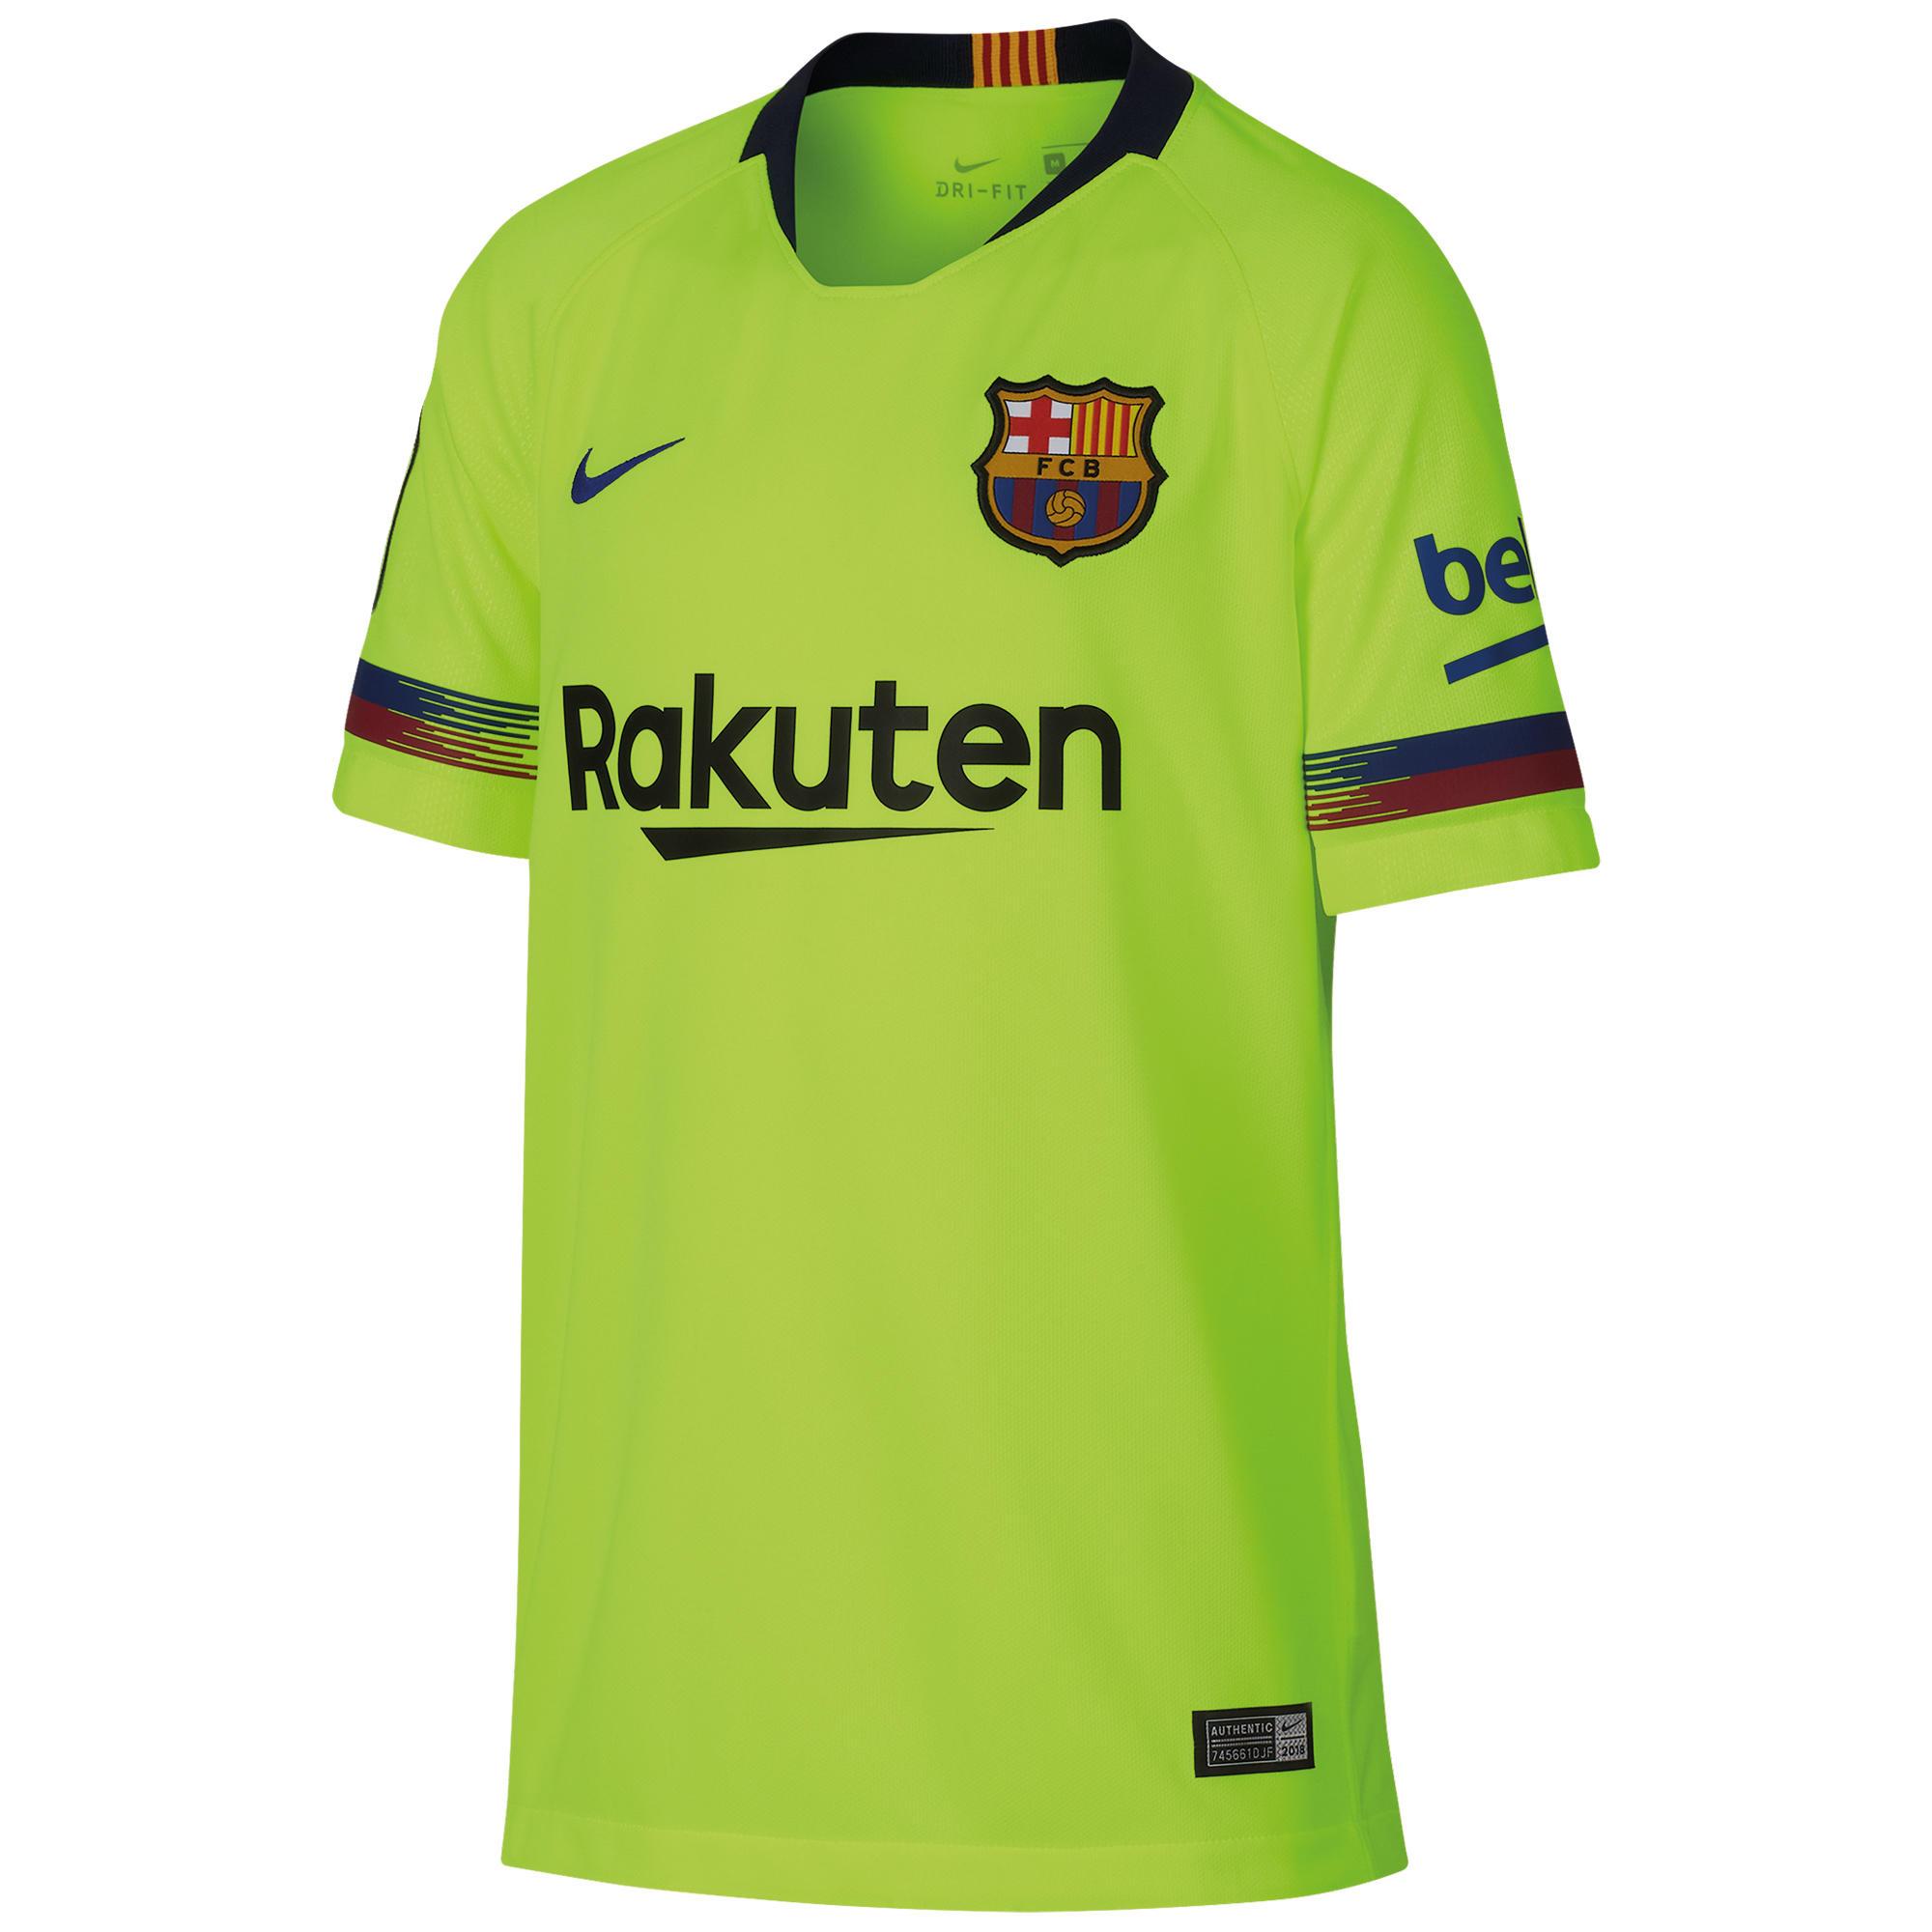 Camiseta de Fútbol Nike oficial F.C. Barcelona 2ª equipación hombre  2018 2019 3c860c2f5f9d5